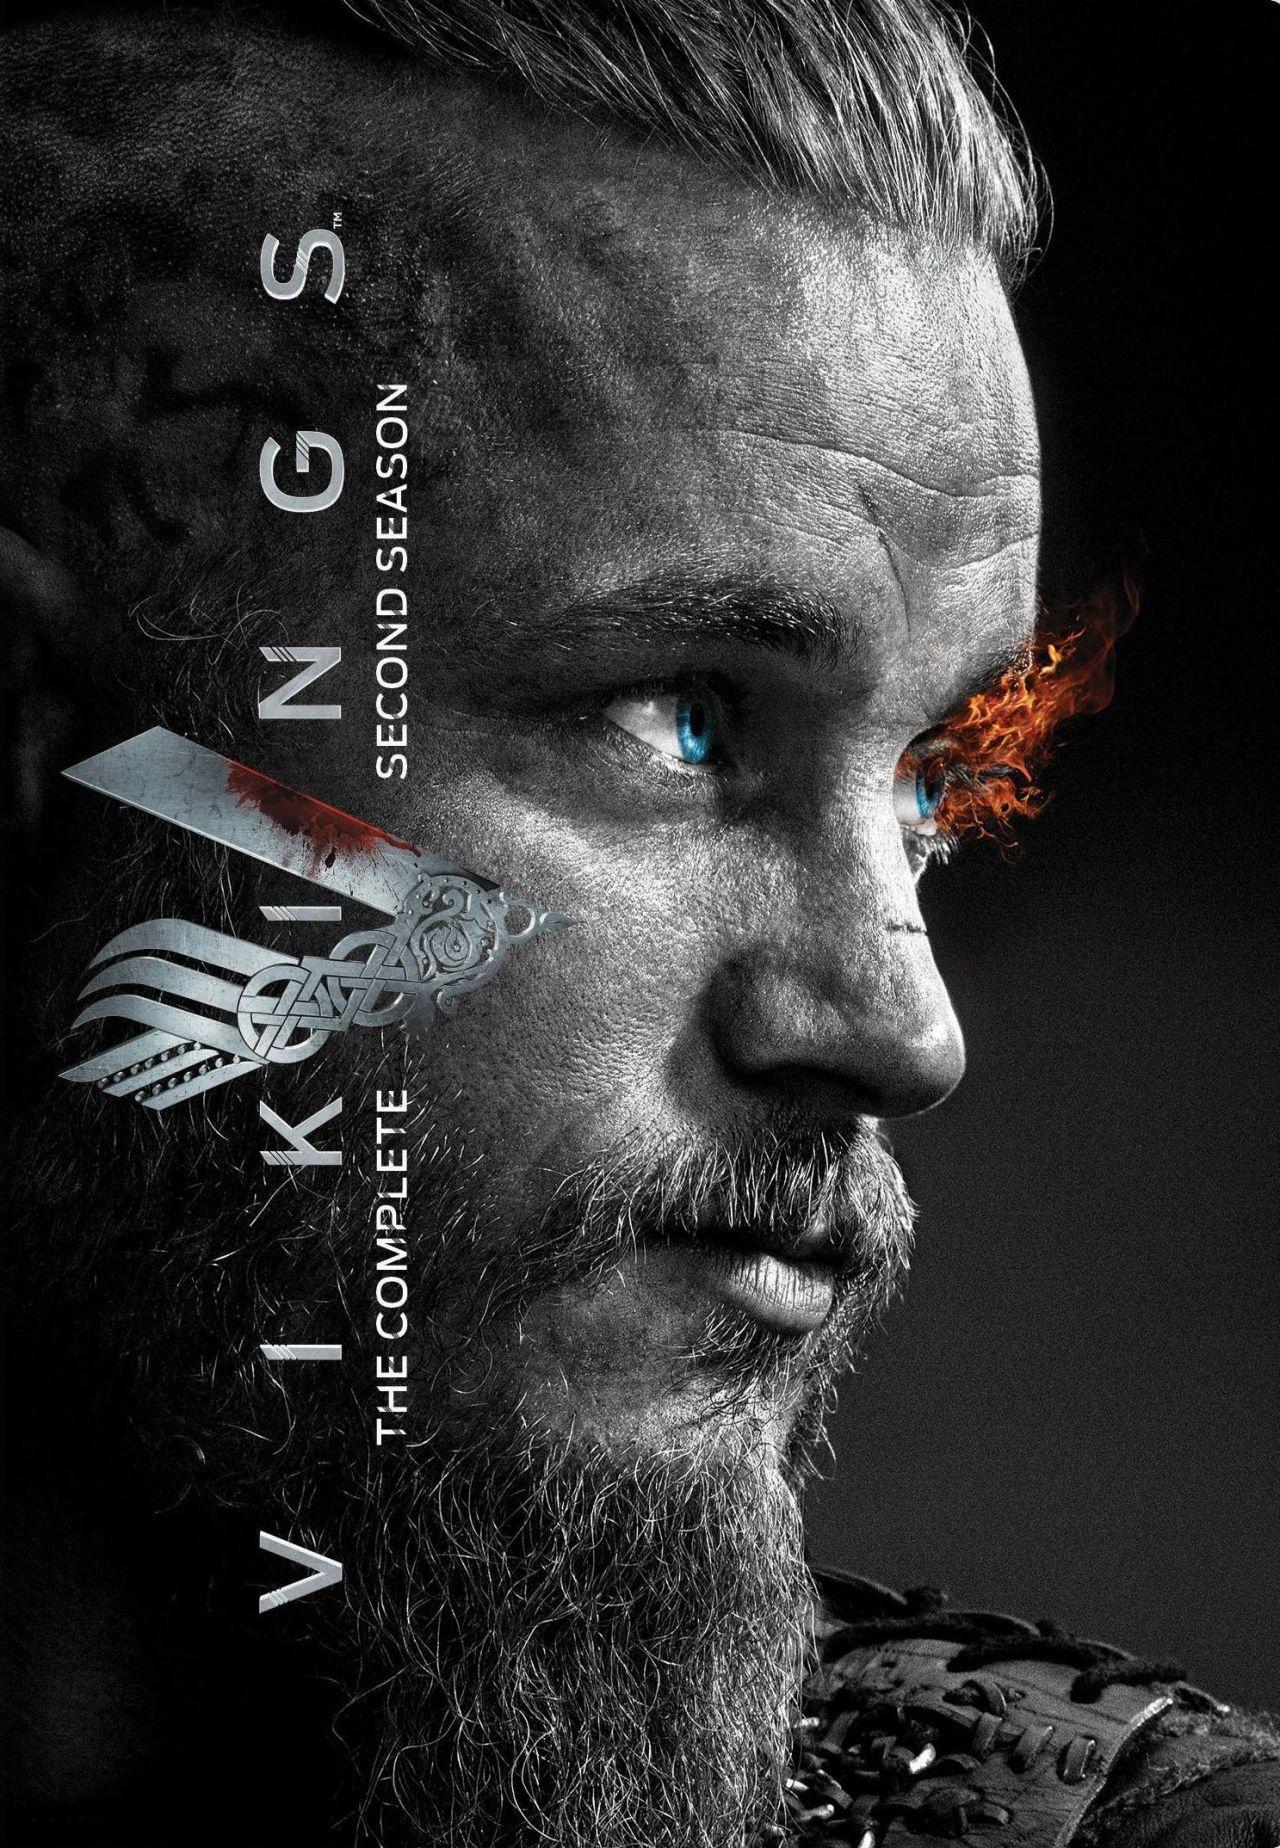 vikings season 2 poster